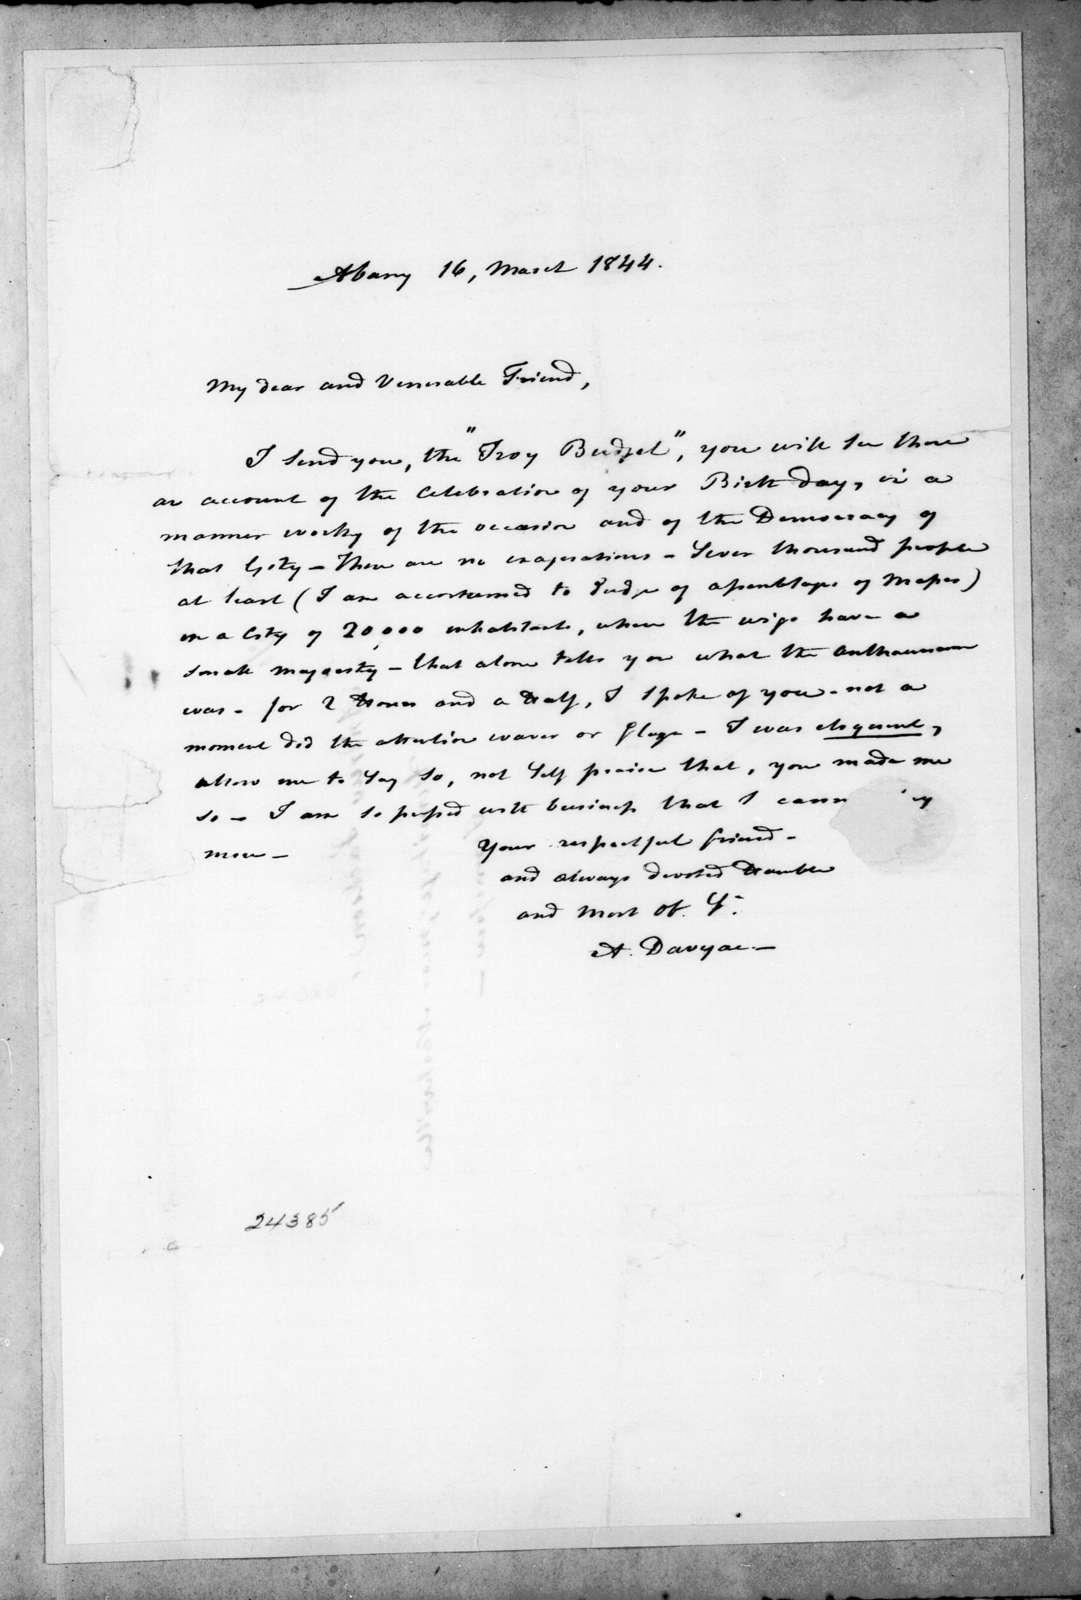 Auguste Genevieve Valentin Davezac to Andrew Jackson, March 16, 1844